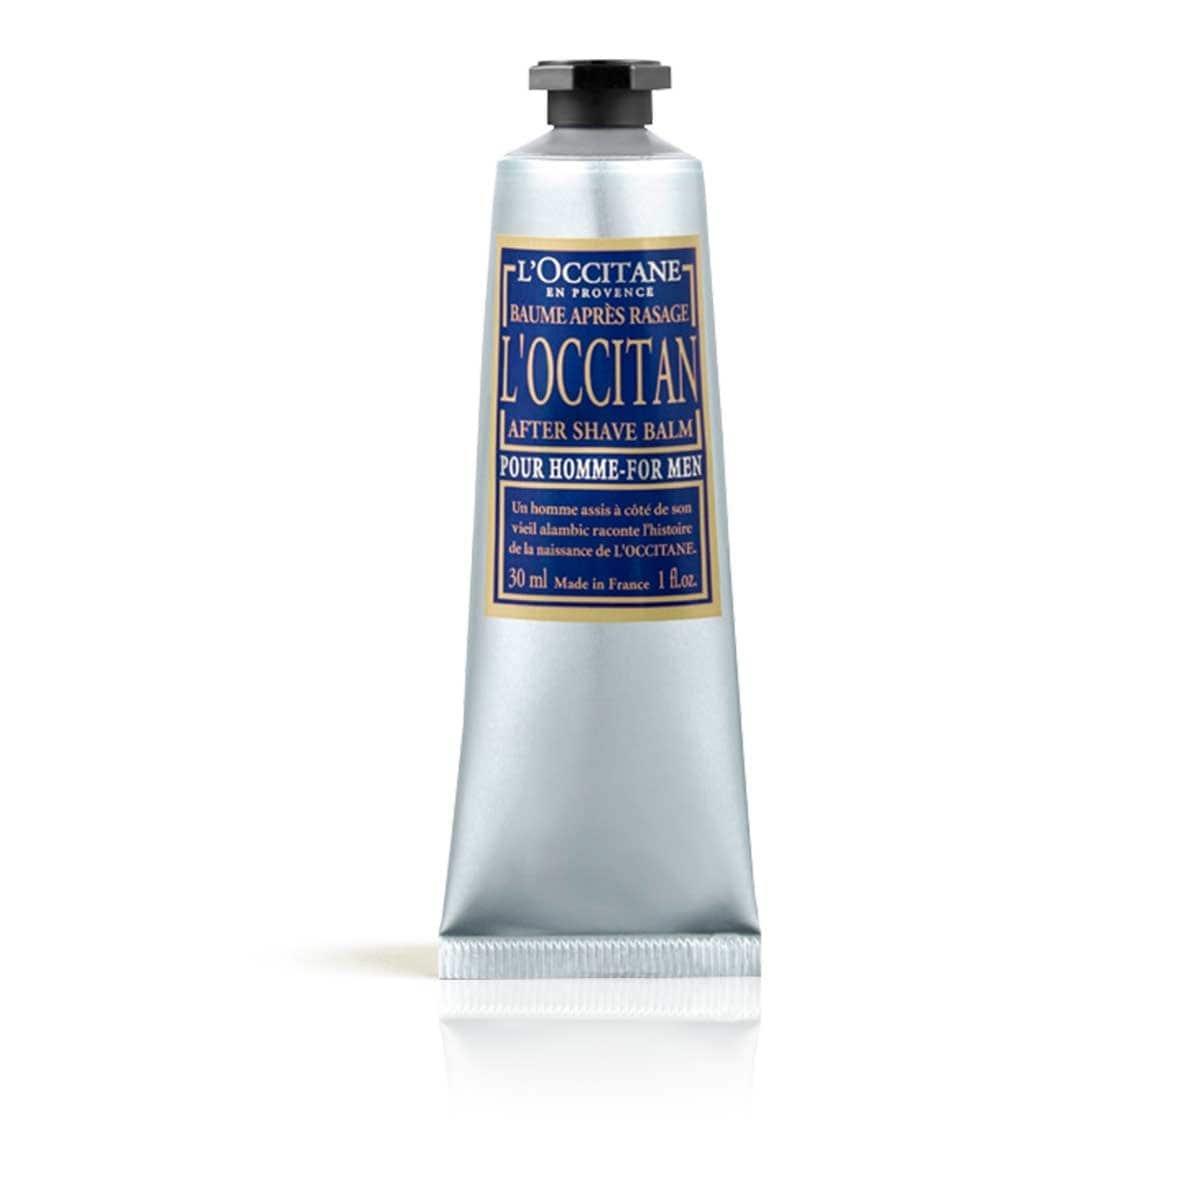 Bálsamo Aftershave L'Occitan - 30 ml L' OCCITANE